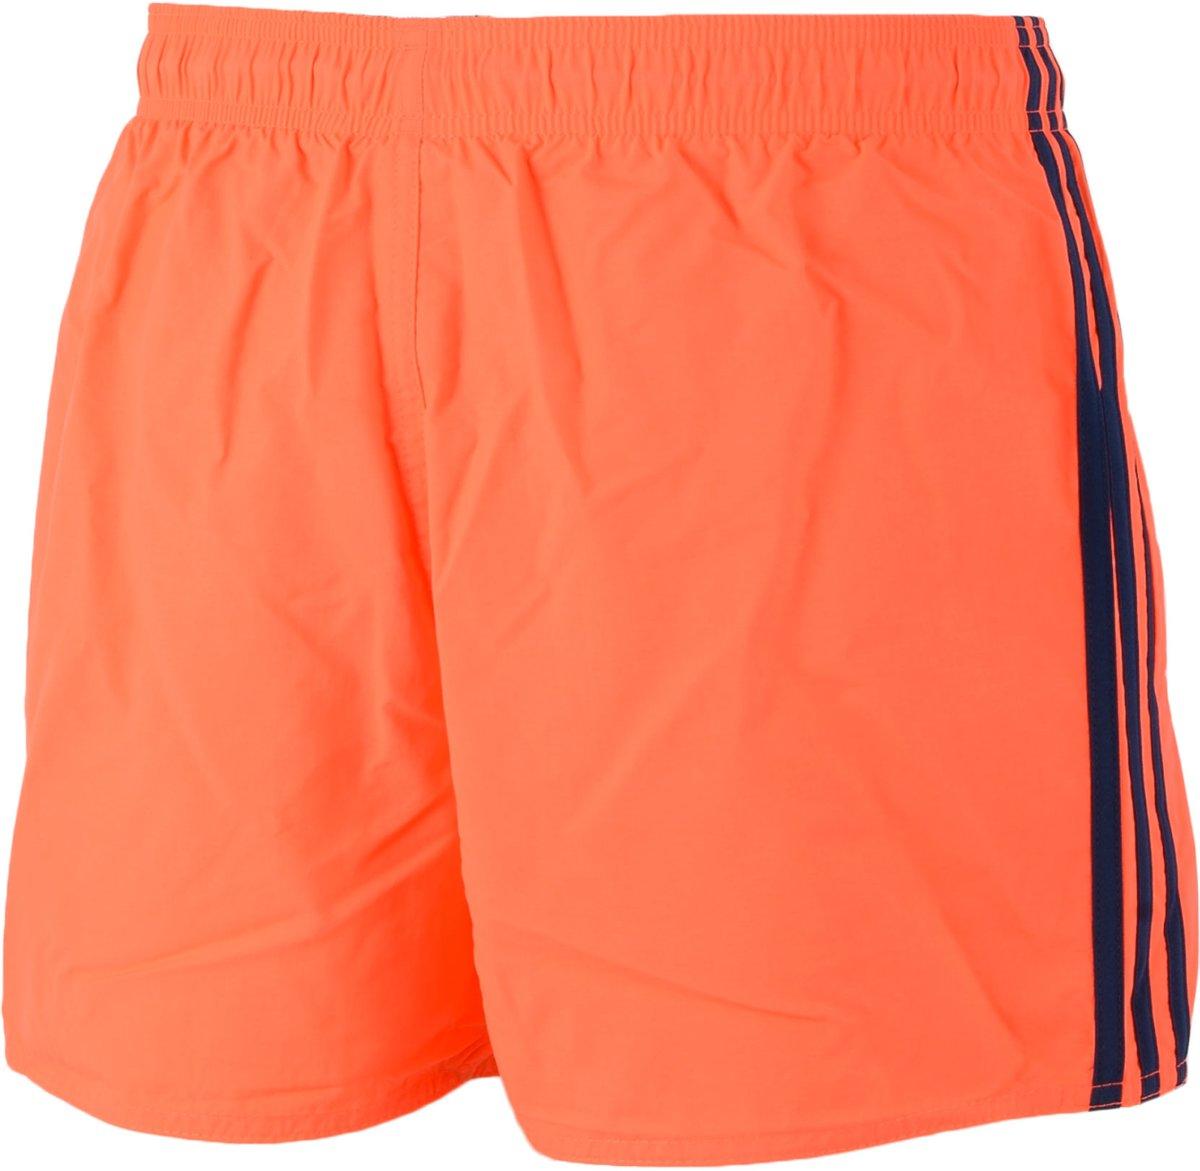 bol.com | adidas 3 Stripes Authentic - Zwembroek - Mannen - Maat XL -  Oranje/ Zwart